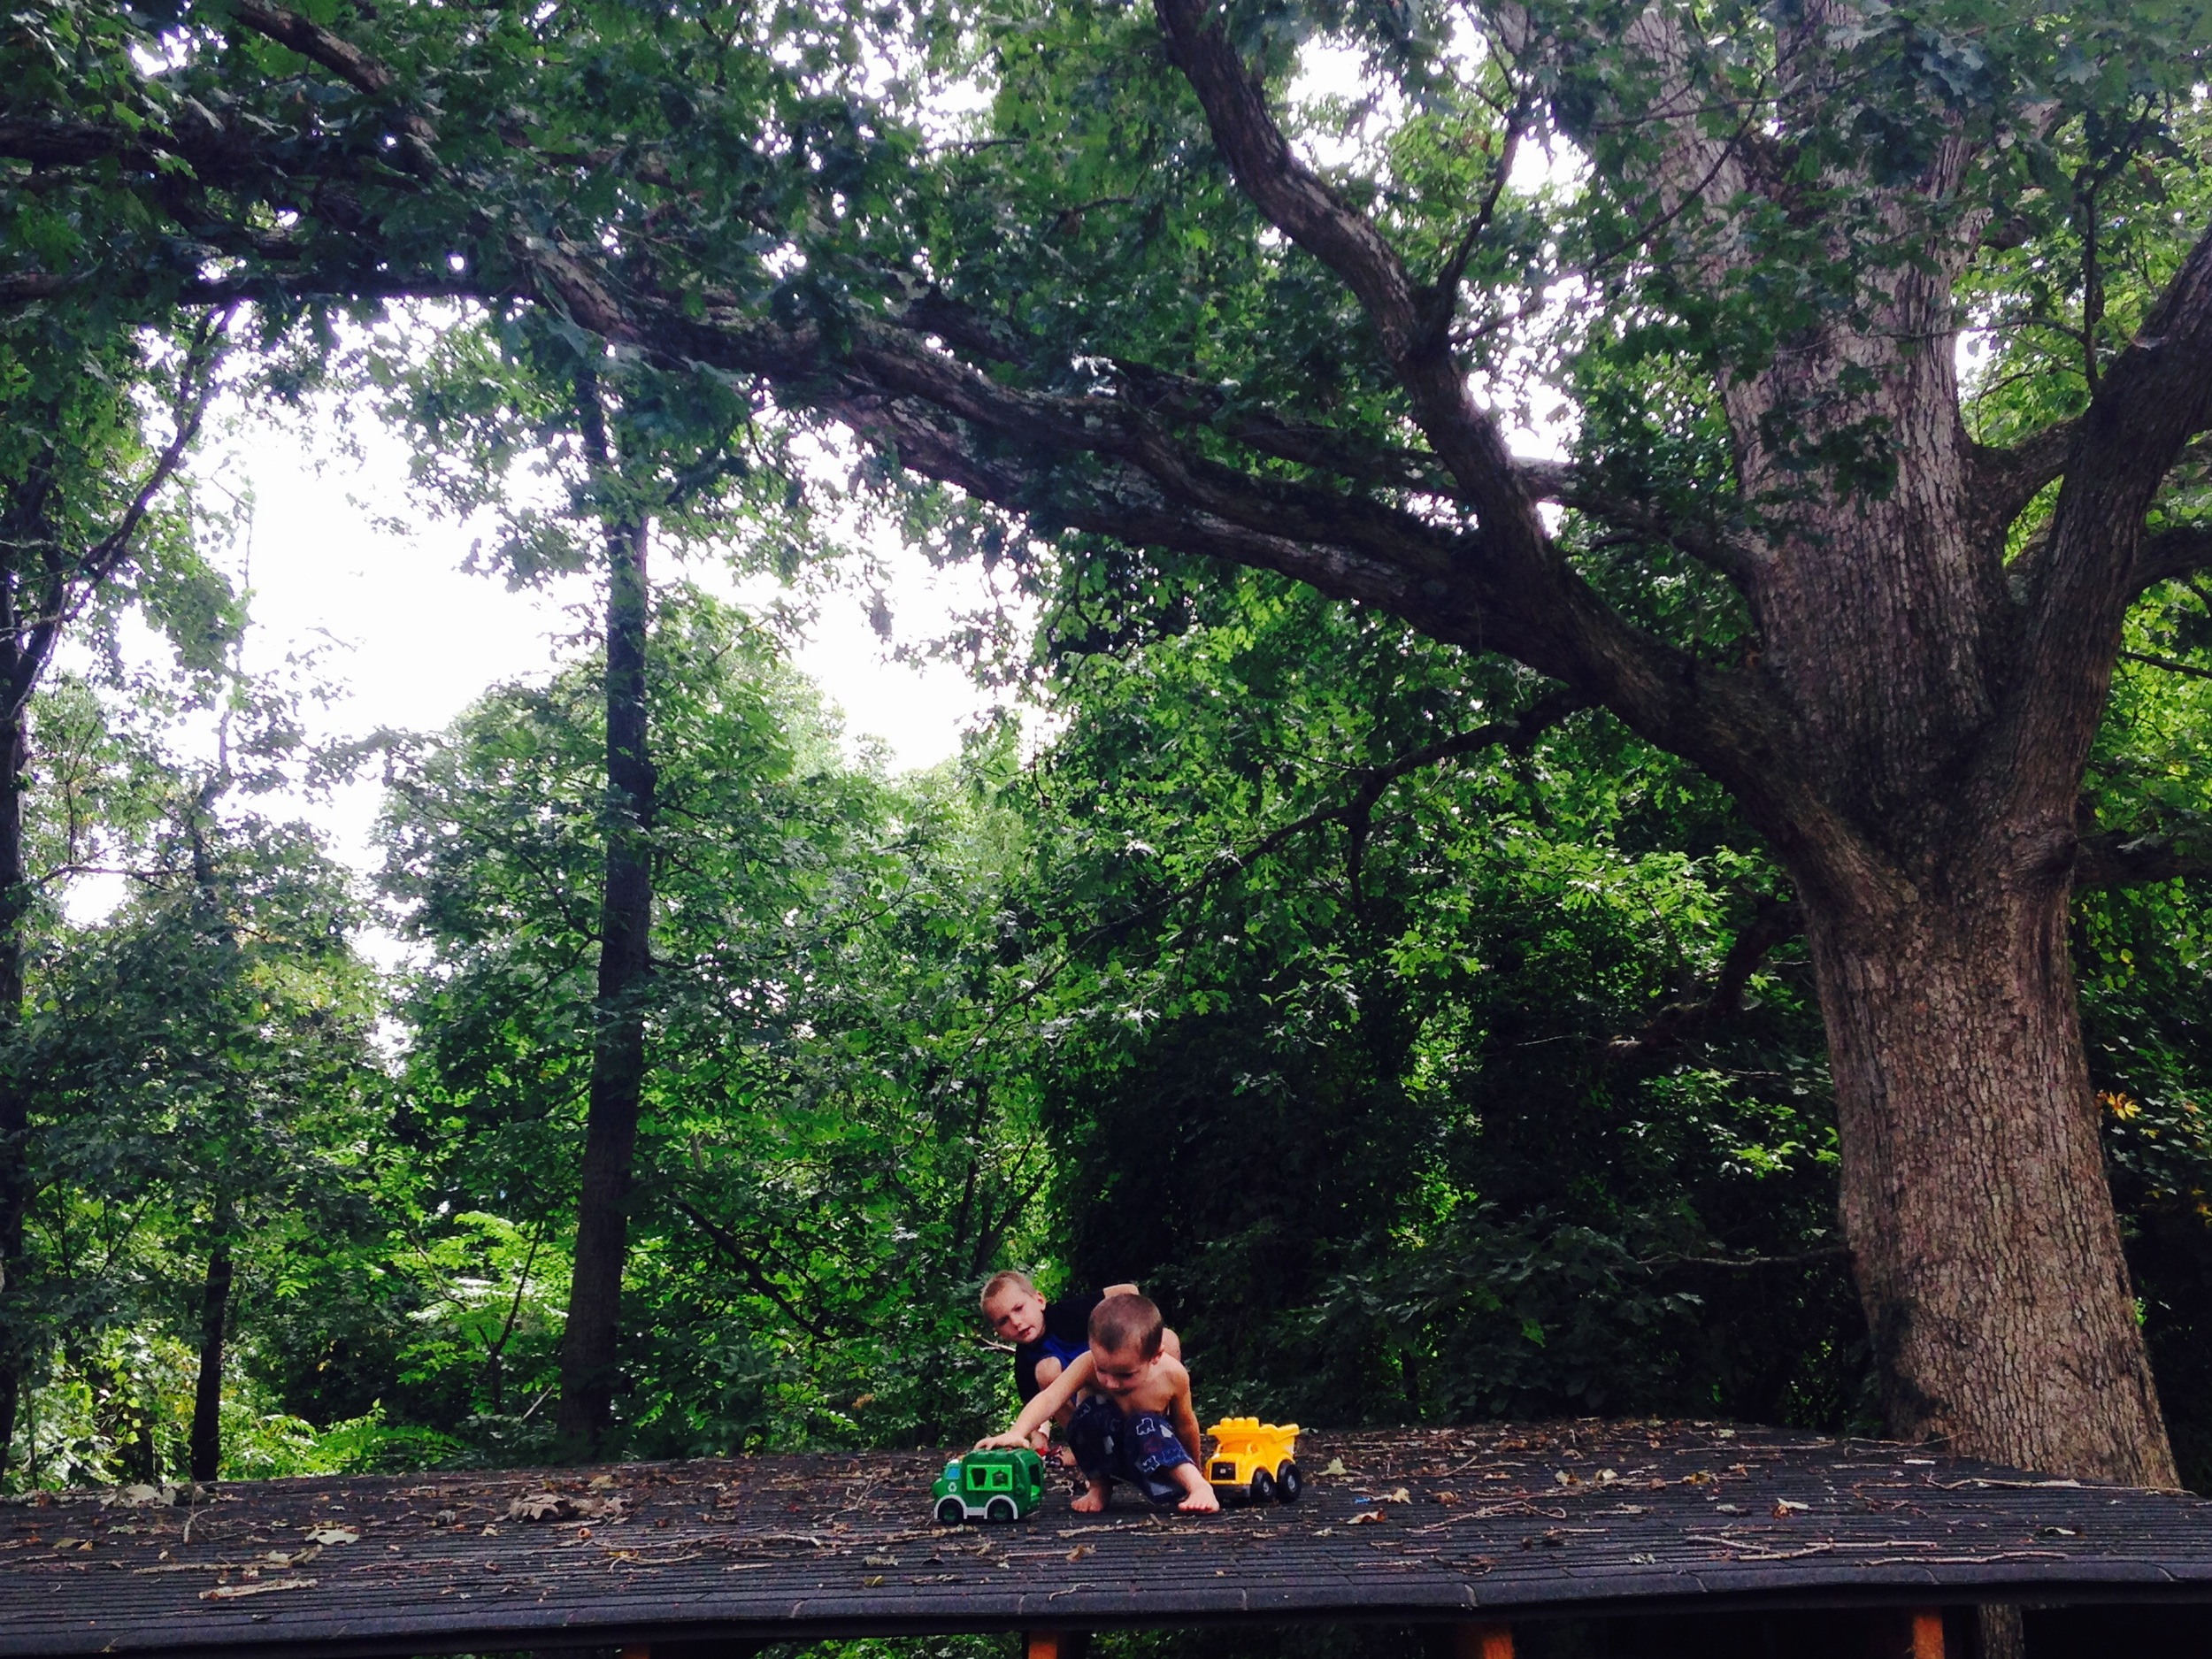 kids in trees_roof old fairview aug 2015.jpg